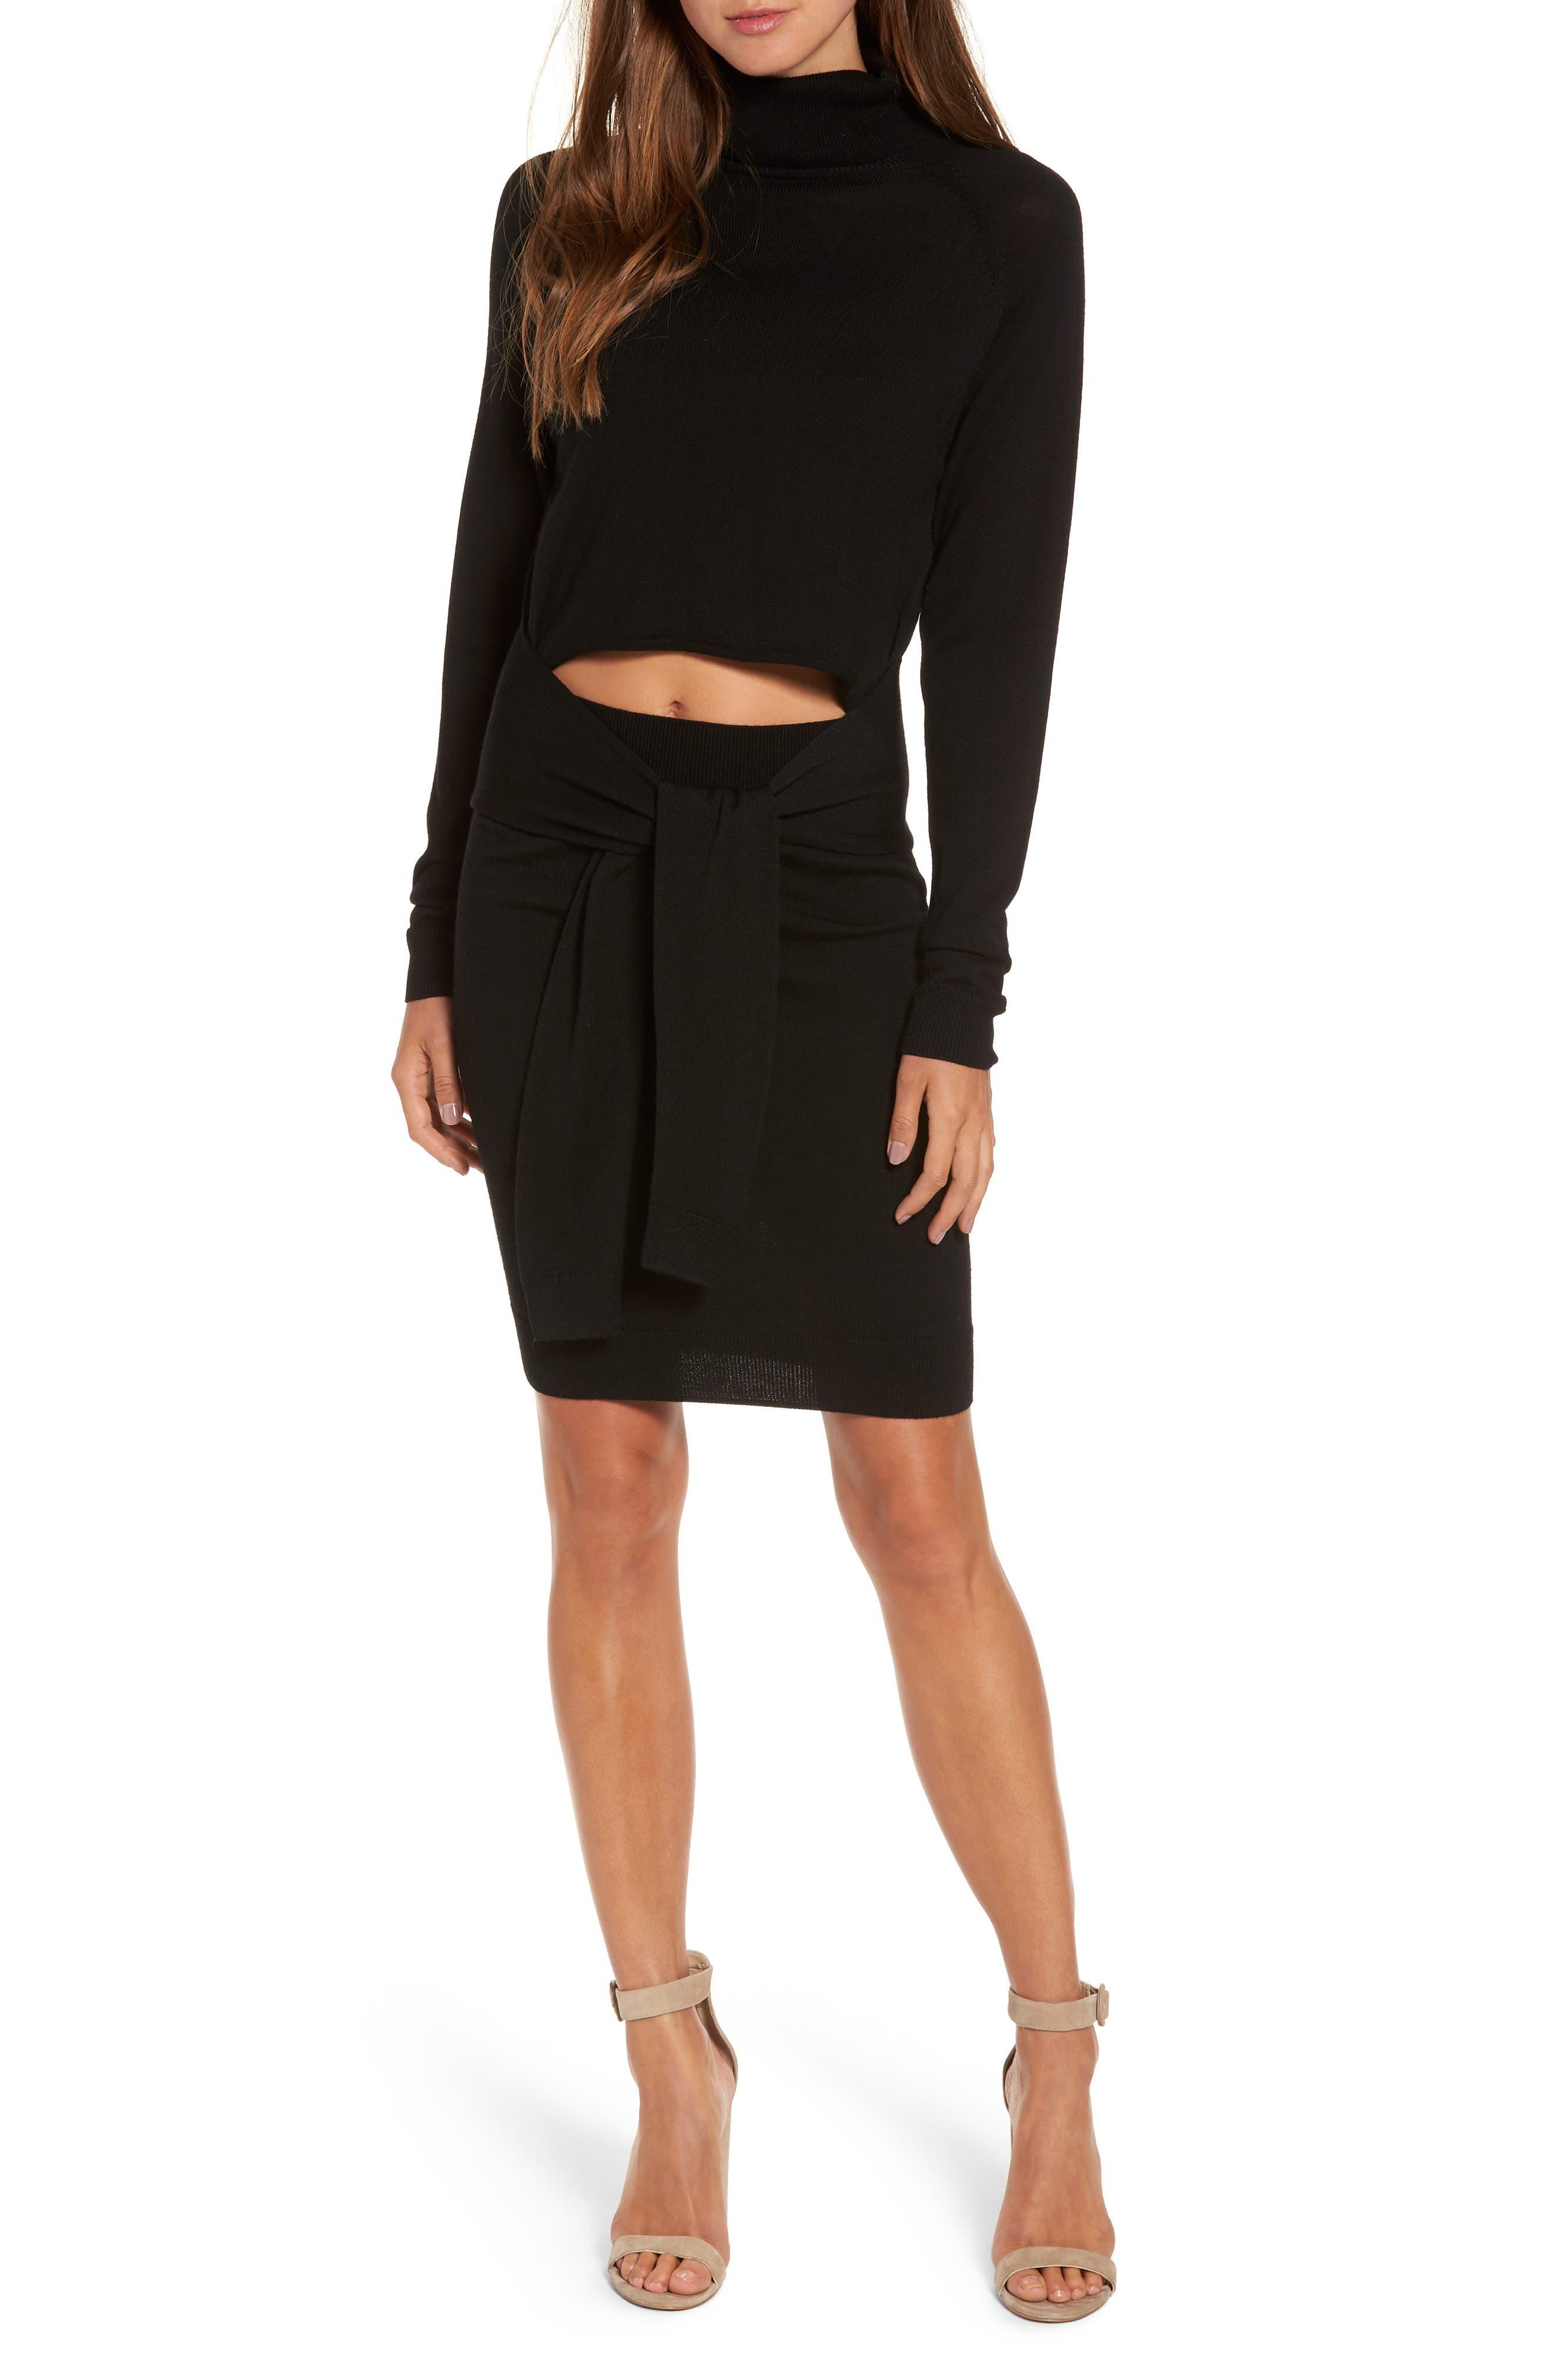 Main Image - KENDALL + KYLIE Tie Front Turtleneck Dress